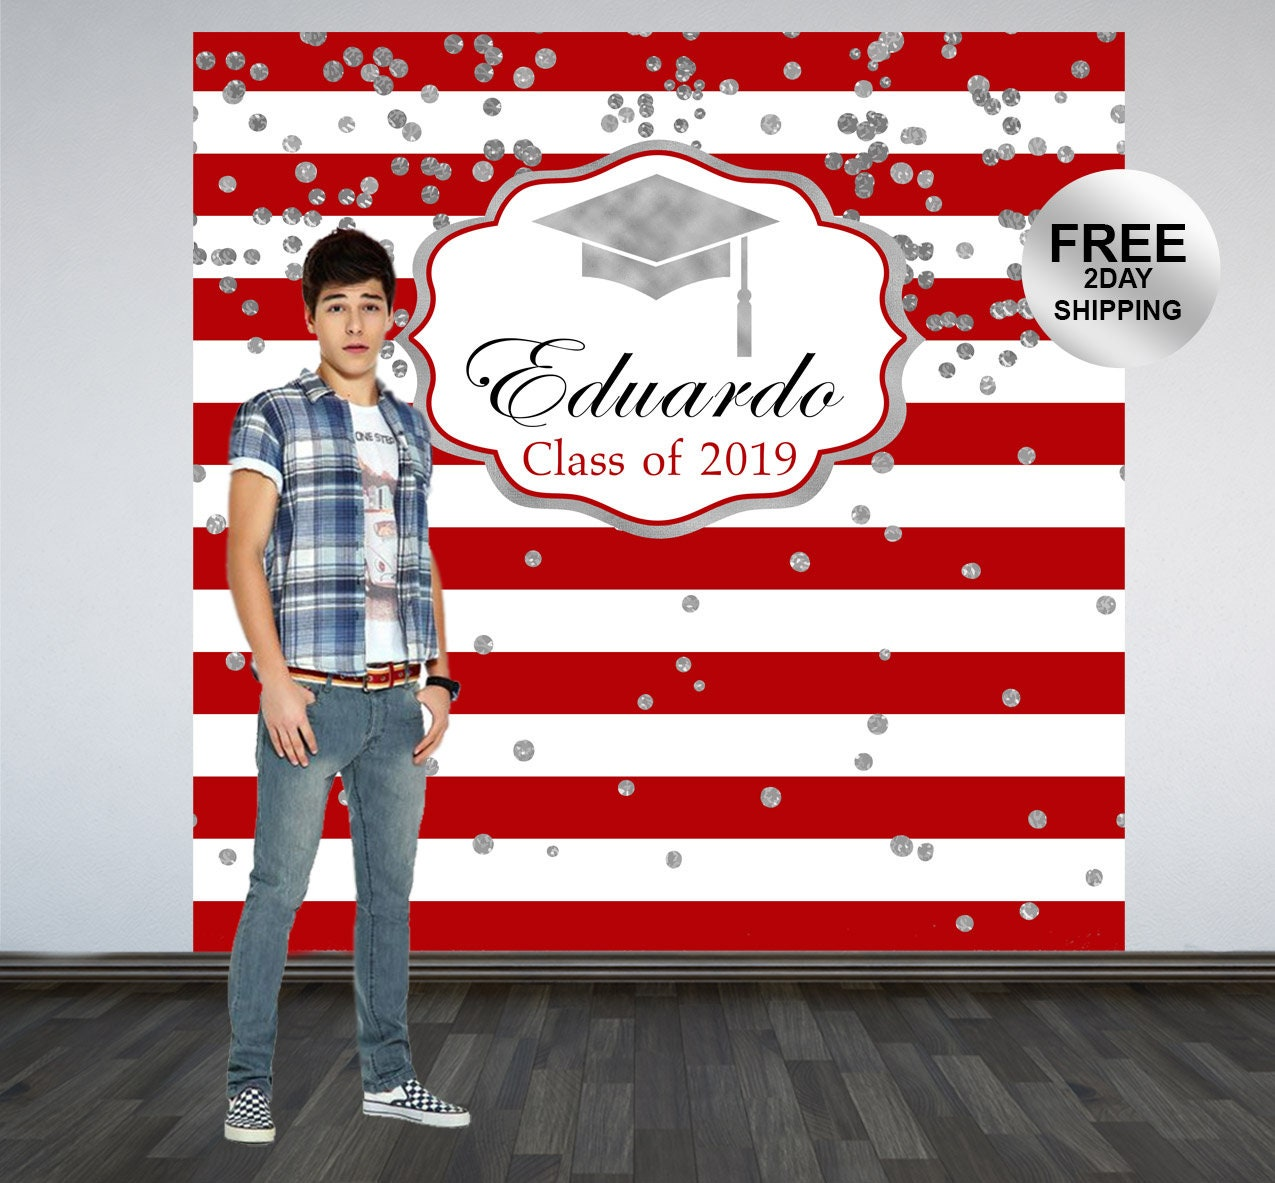 8a4fd04620 Graduation Photo Backdrop | Red and White Stripes Photo Backdrop ...